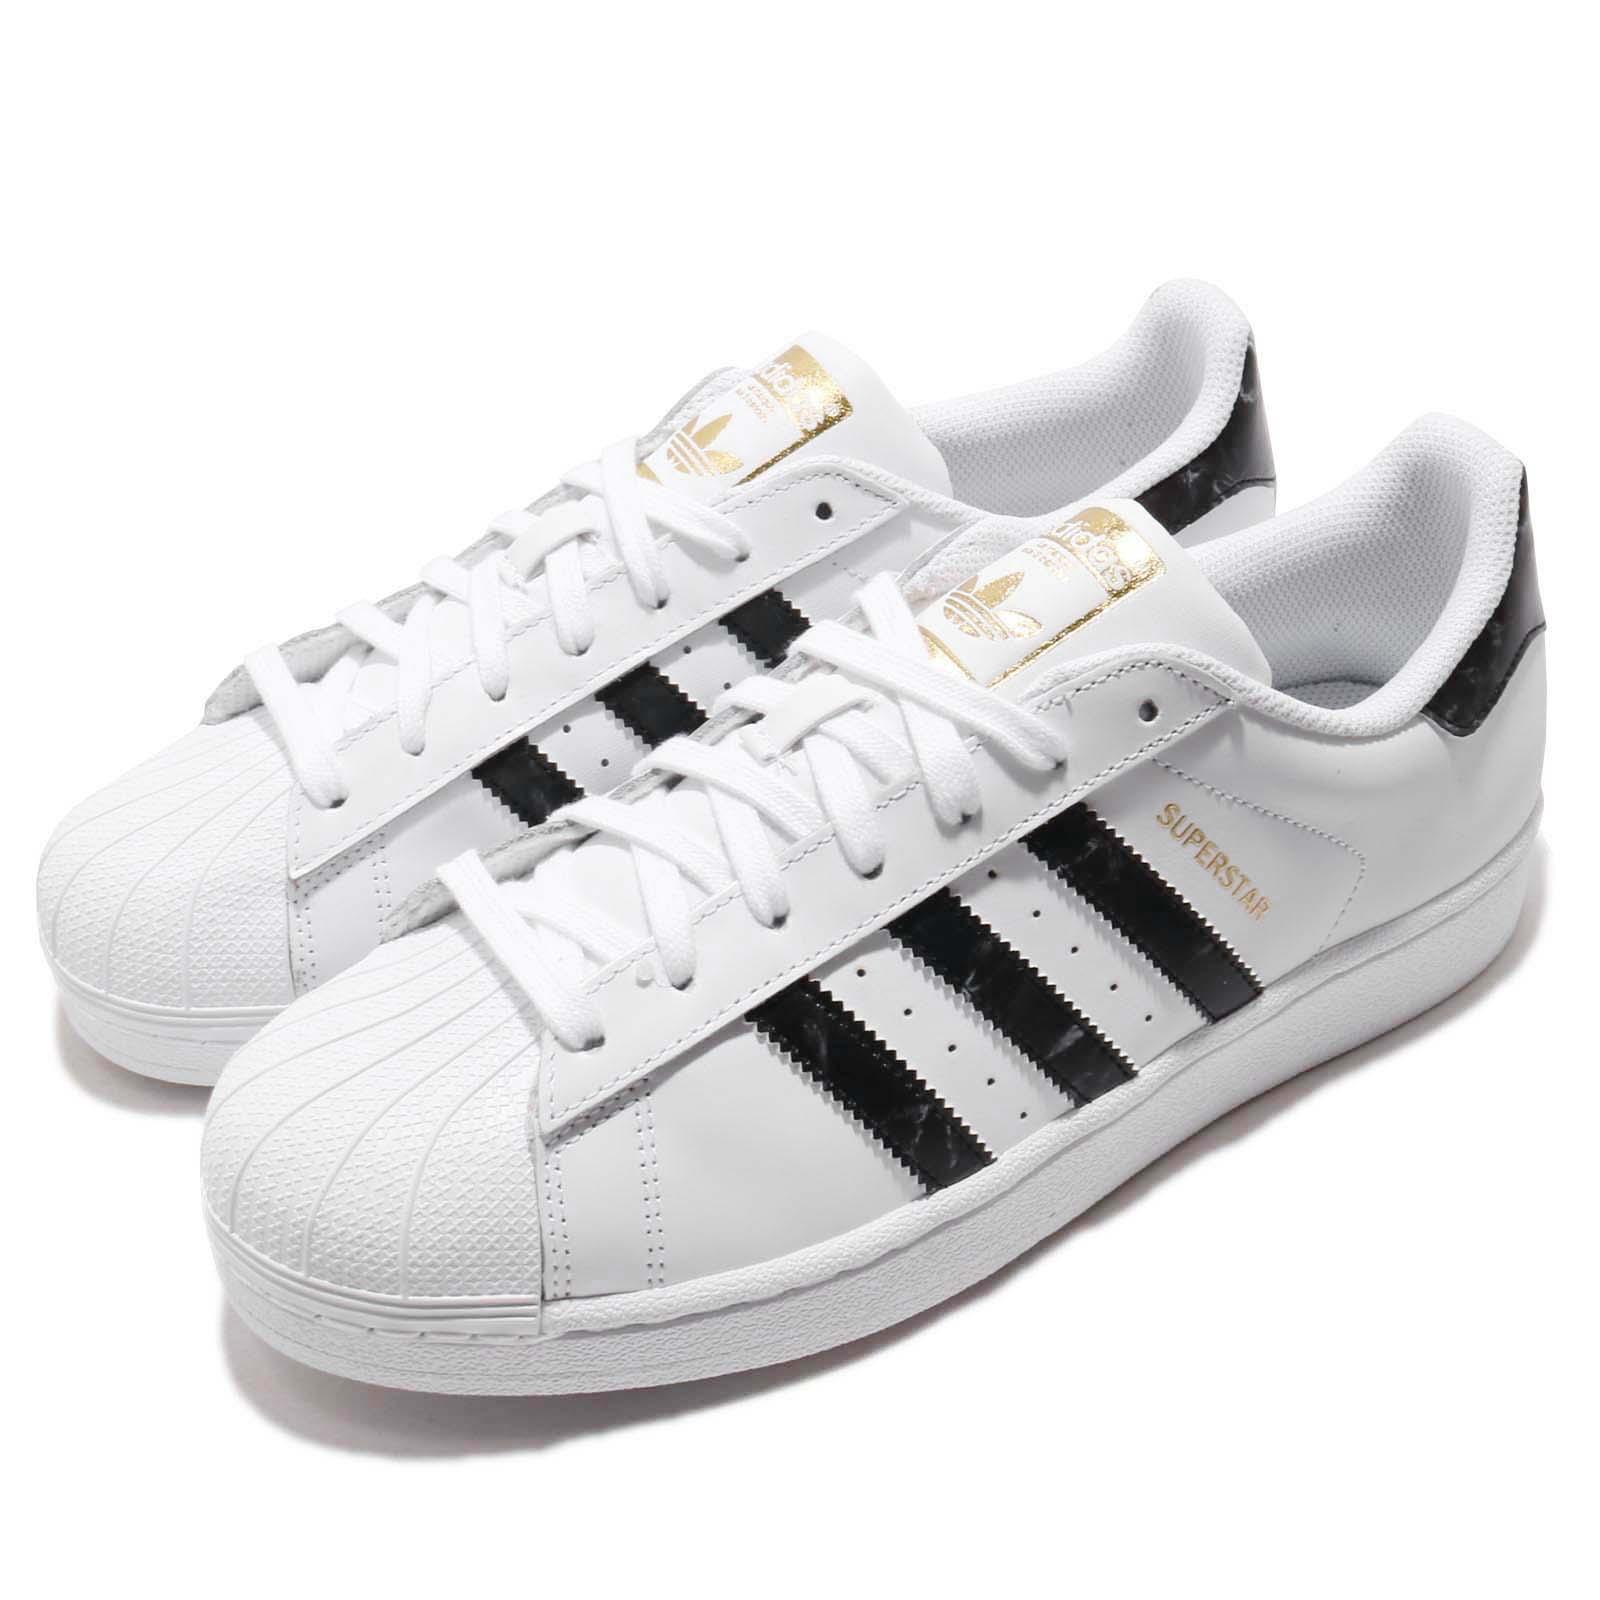 adidas 休閒鞋 Superstar 低筒 運動 男女鞋 D96799